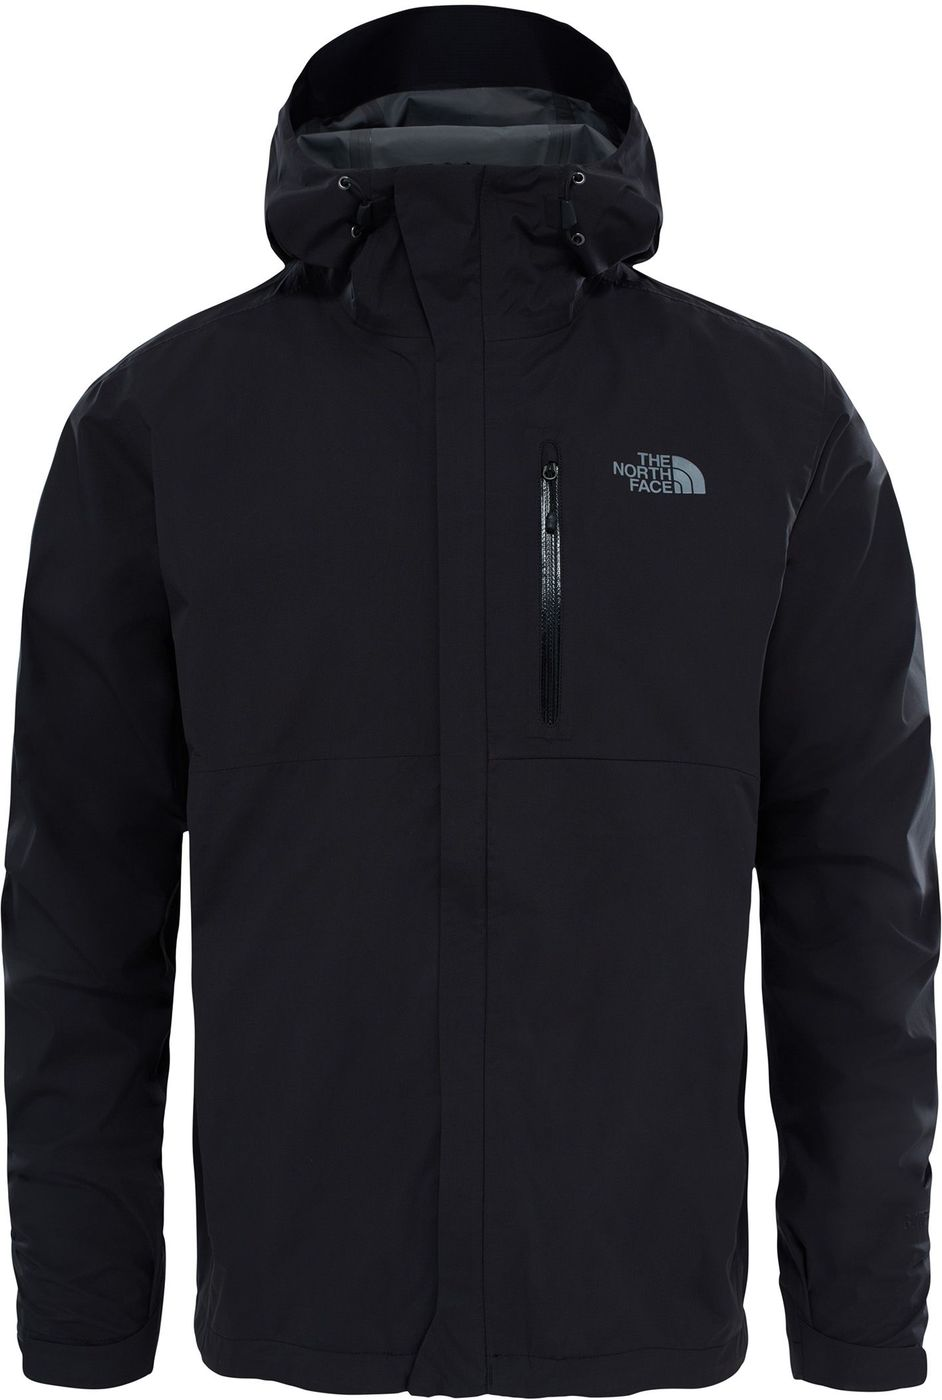 ... jacket mens tnf black canary a2a77 34f27  sale the north face tnf  dryzzle gore tex mens f0646 891cb e1939b865